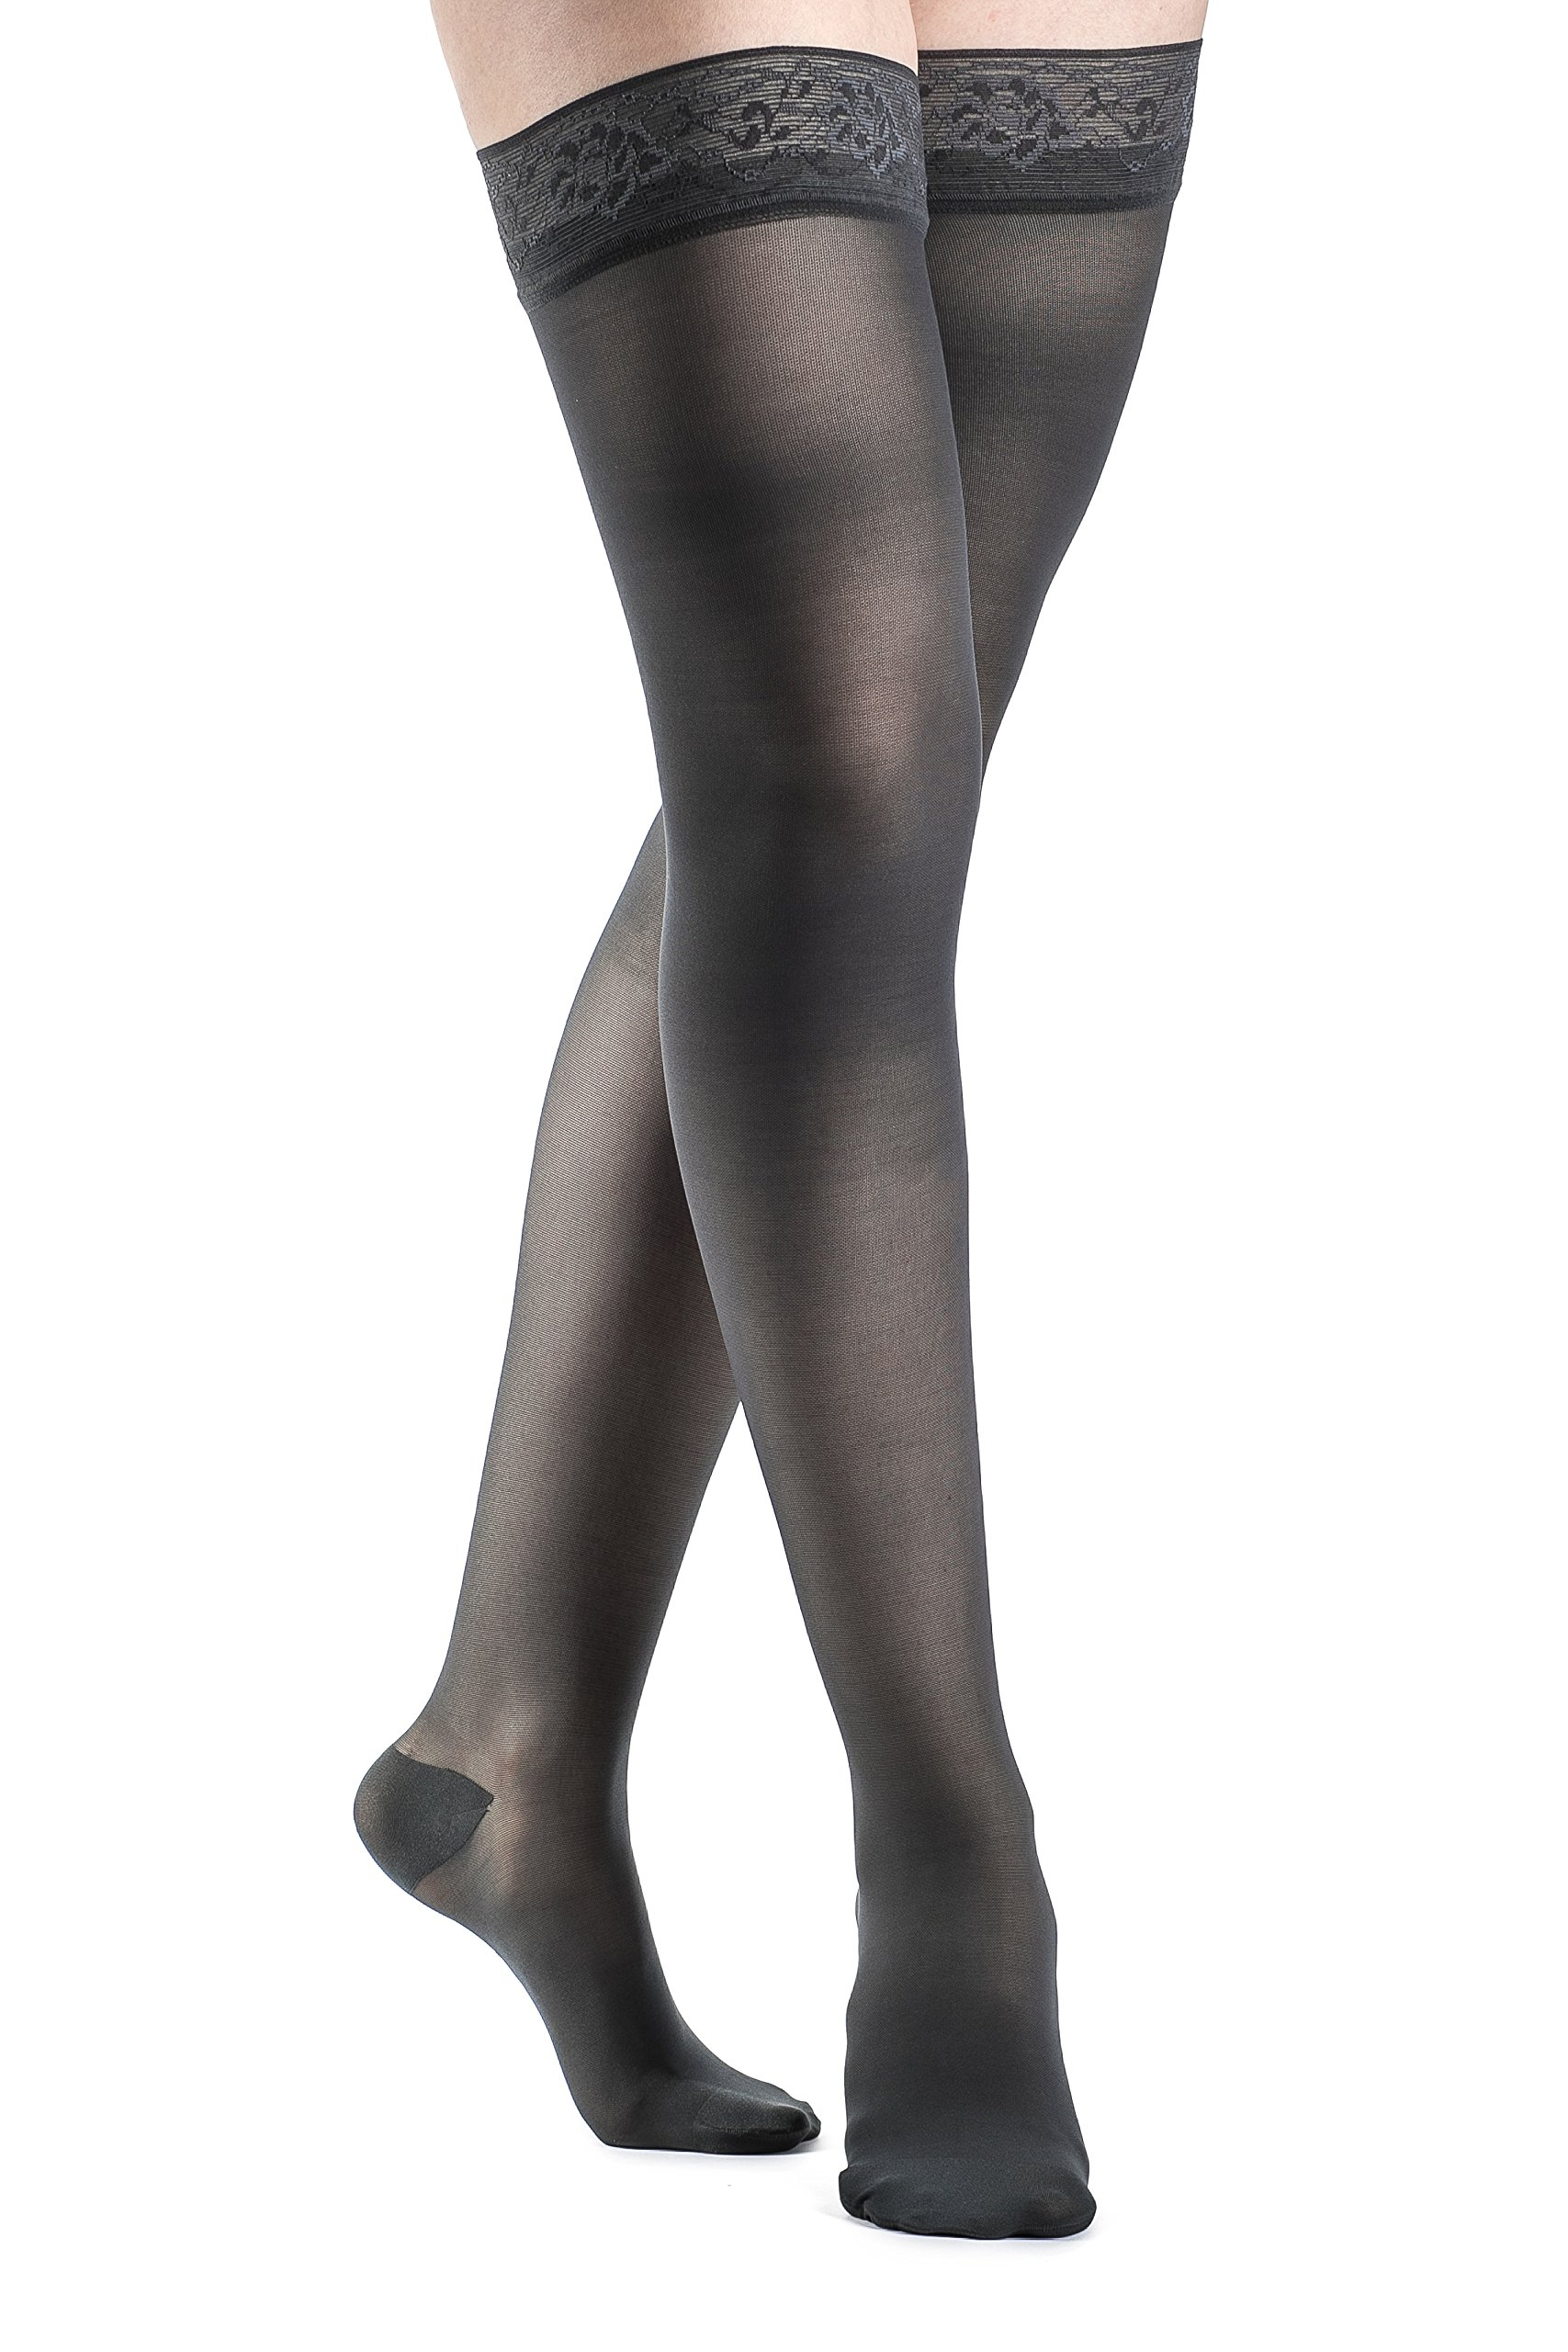 SIGVARIS Women's EVERSHEER 780 Closed Toe Thigh High w/Grip-Top 15-20mmHg